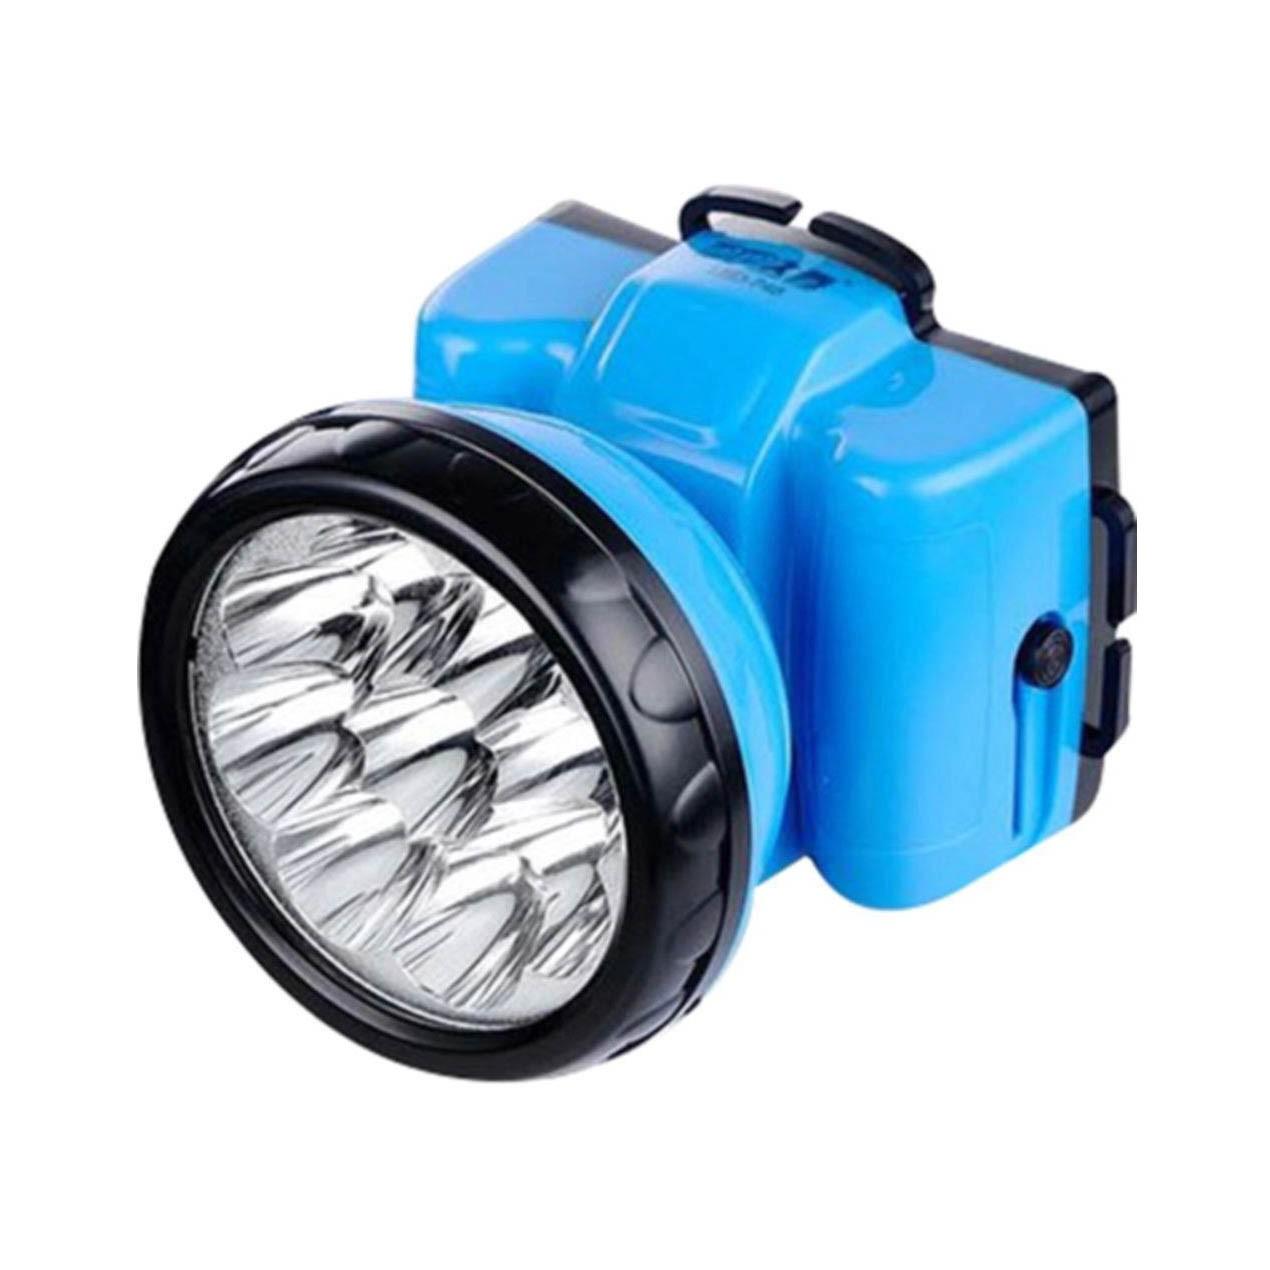 Lanterna De Cabeça Recarregavél DP.LED LIGHT 400mAh 9 Leds Azul - Led-748